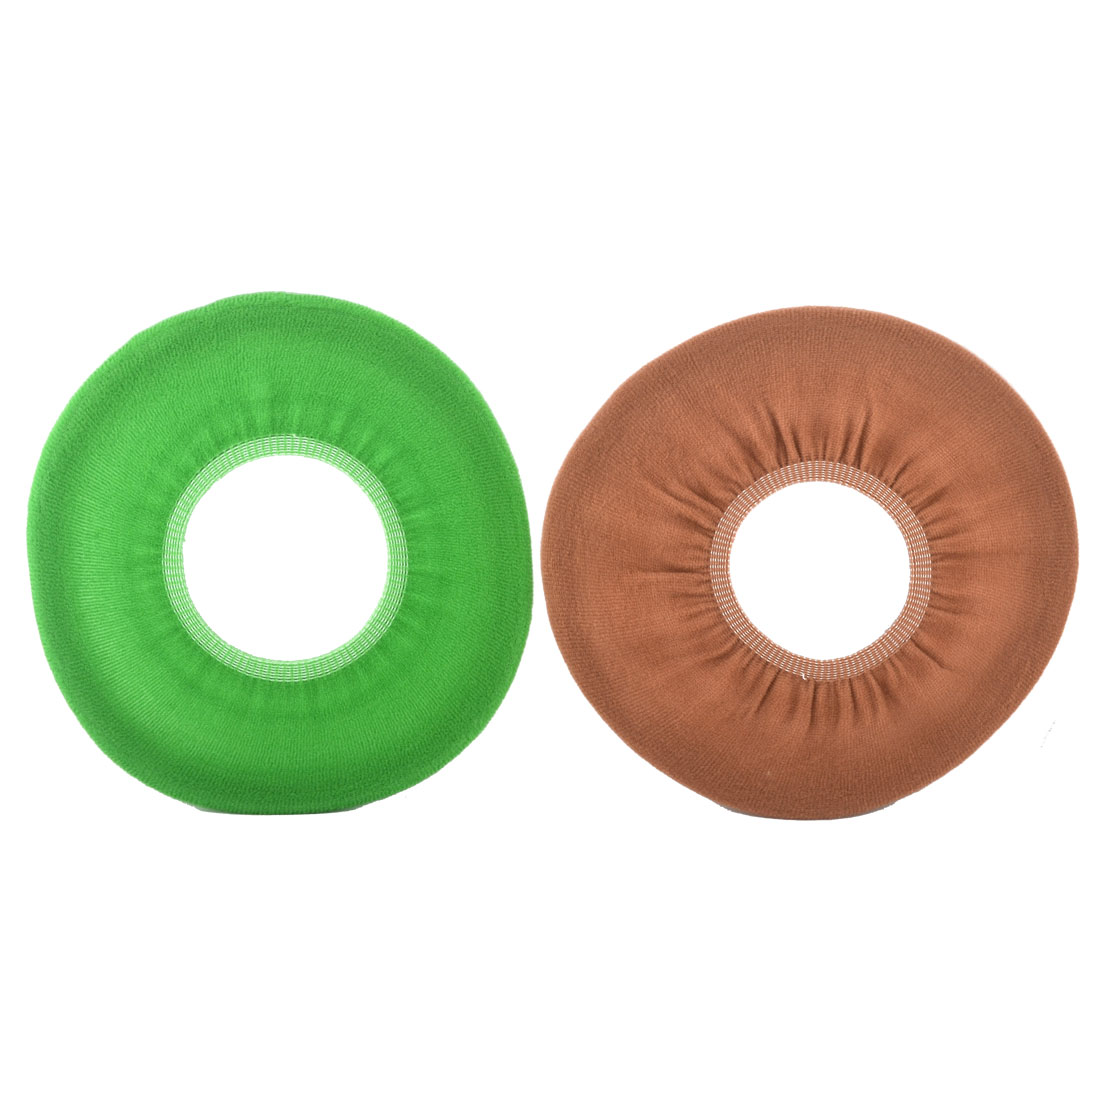 Houseware Polypropylene Fiber O-shaped Warmer Toilet Seat Cover Lid Mat Cushion 2pcs